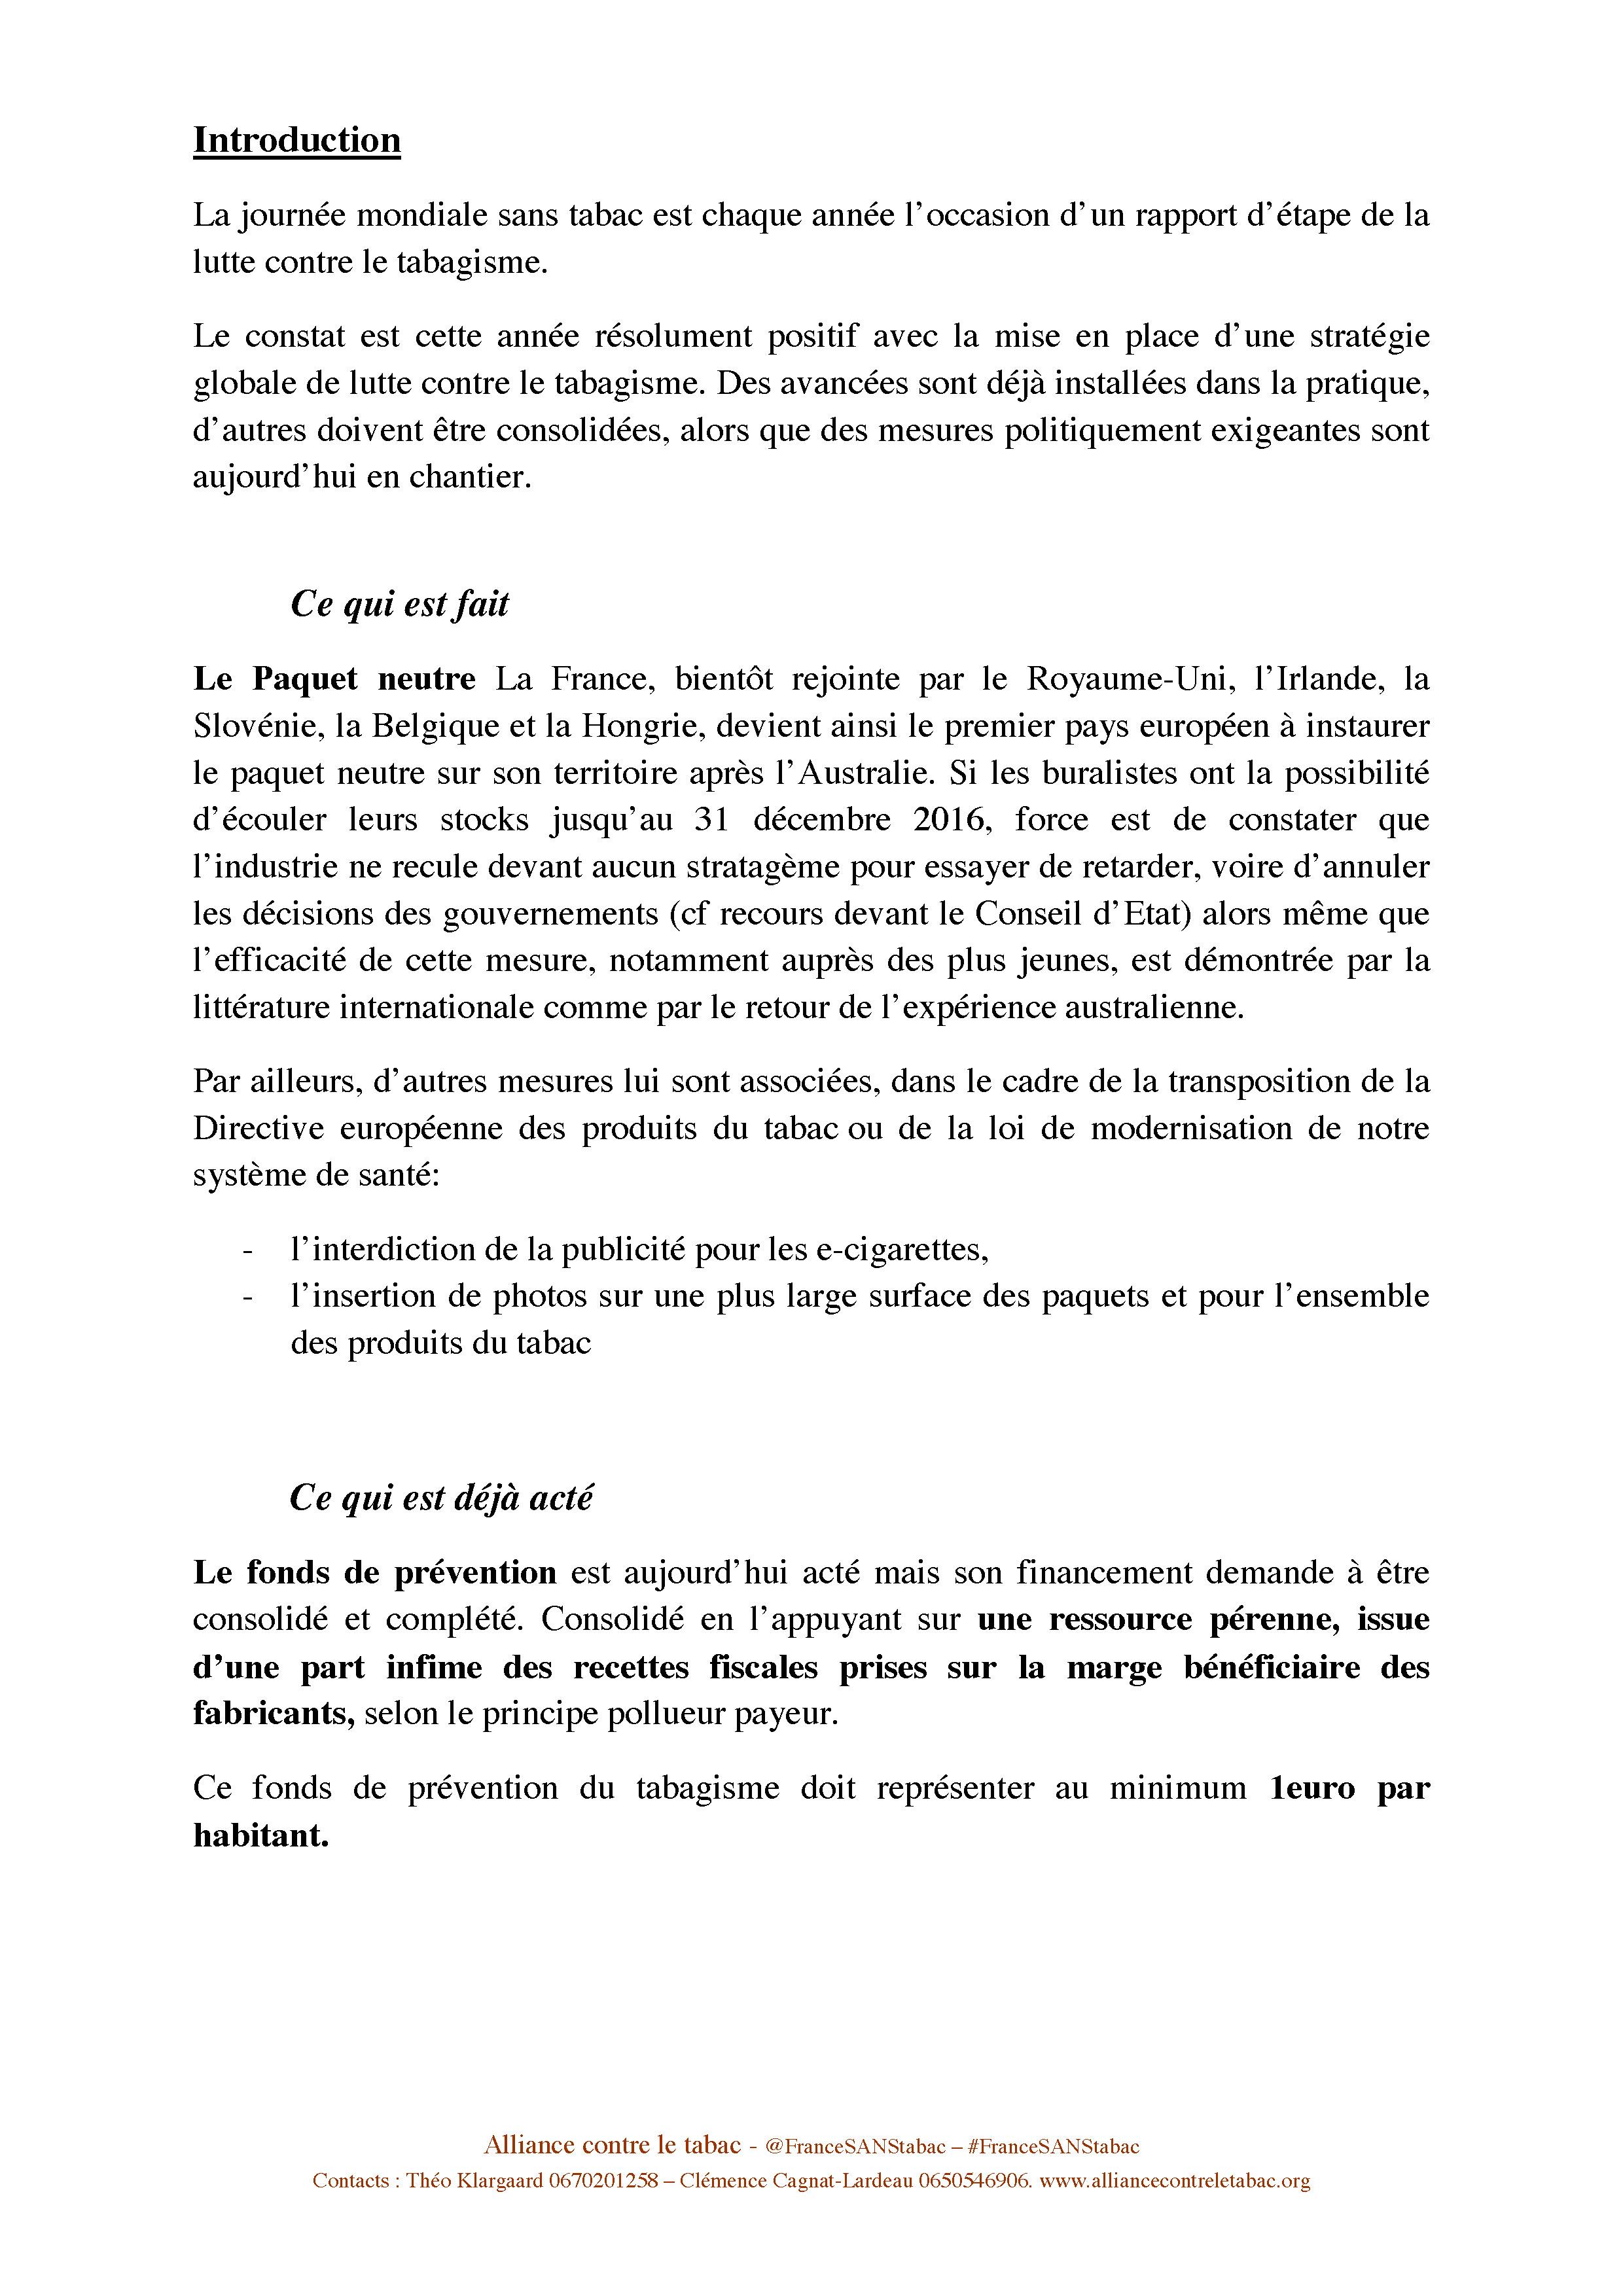 Alliance-DP_journee-mondiale-sans-tabac-avec-annexes-vf-30mai2016_Page_02.jpg